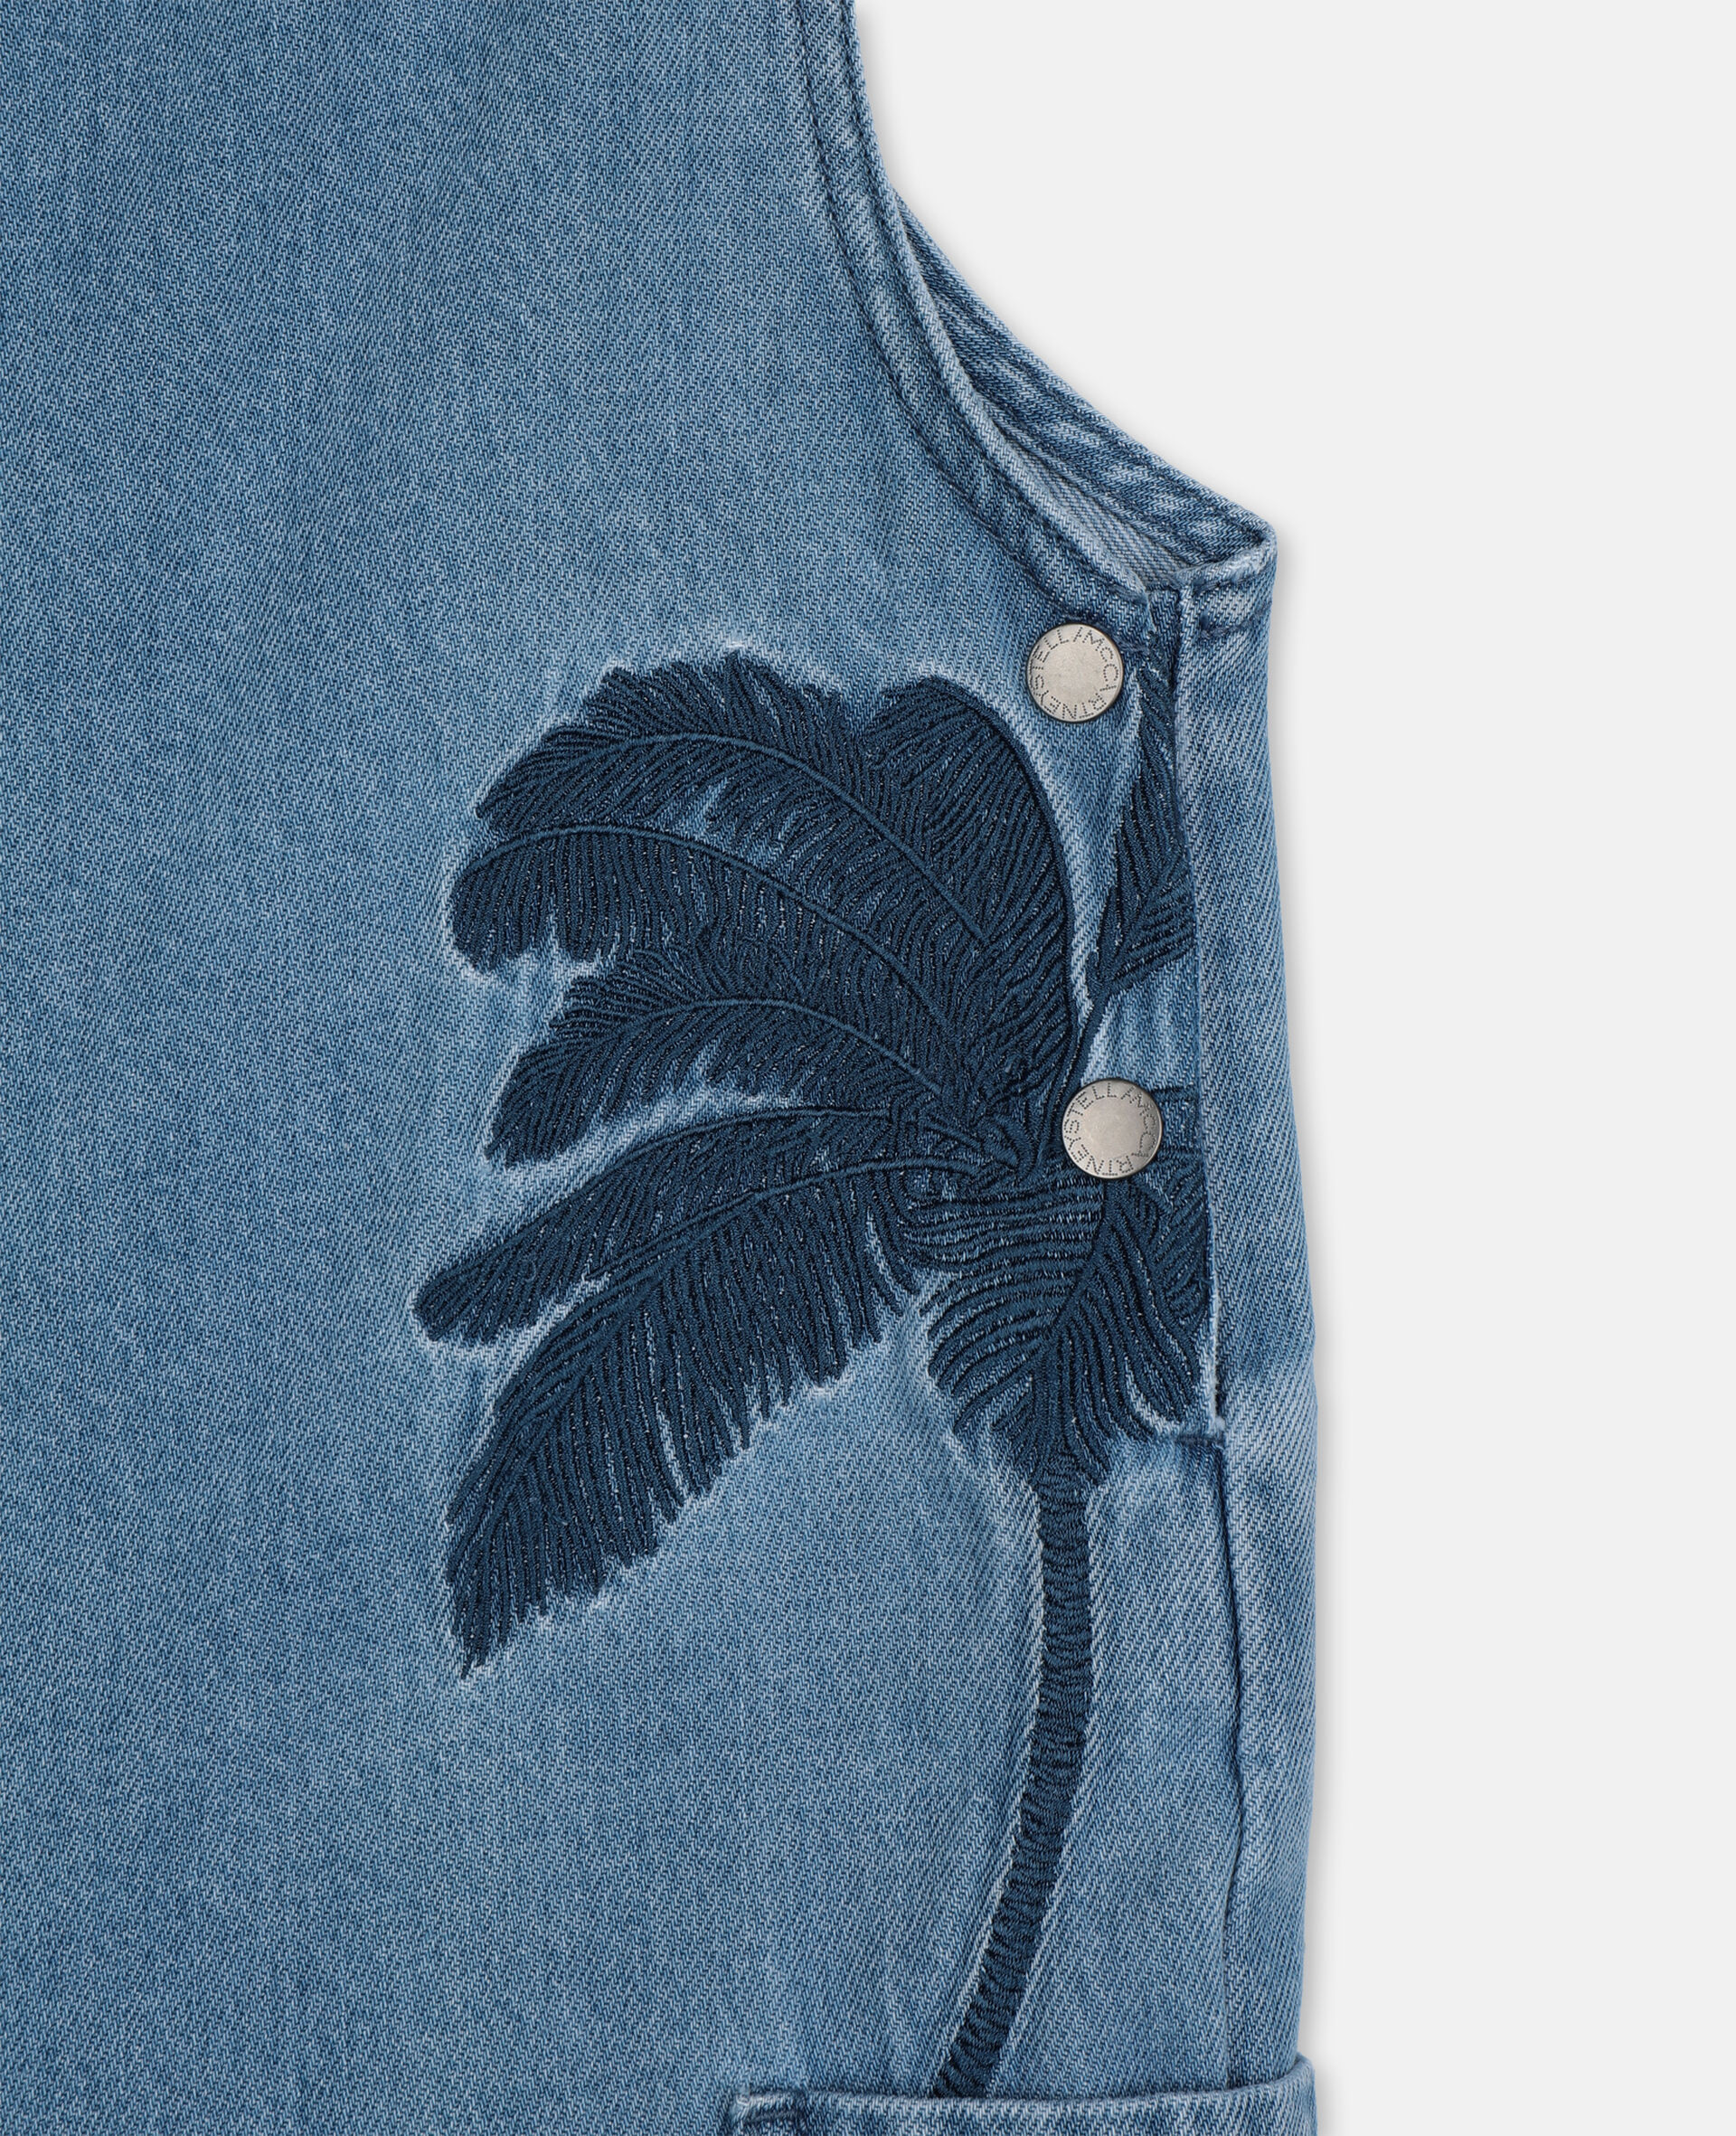 Embroidered Palms Denim Dungaree-Blue-large image number 2